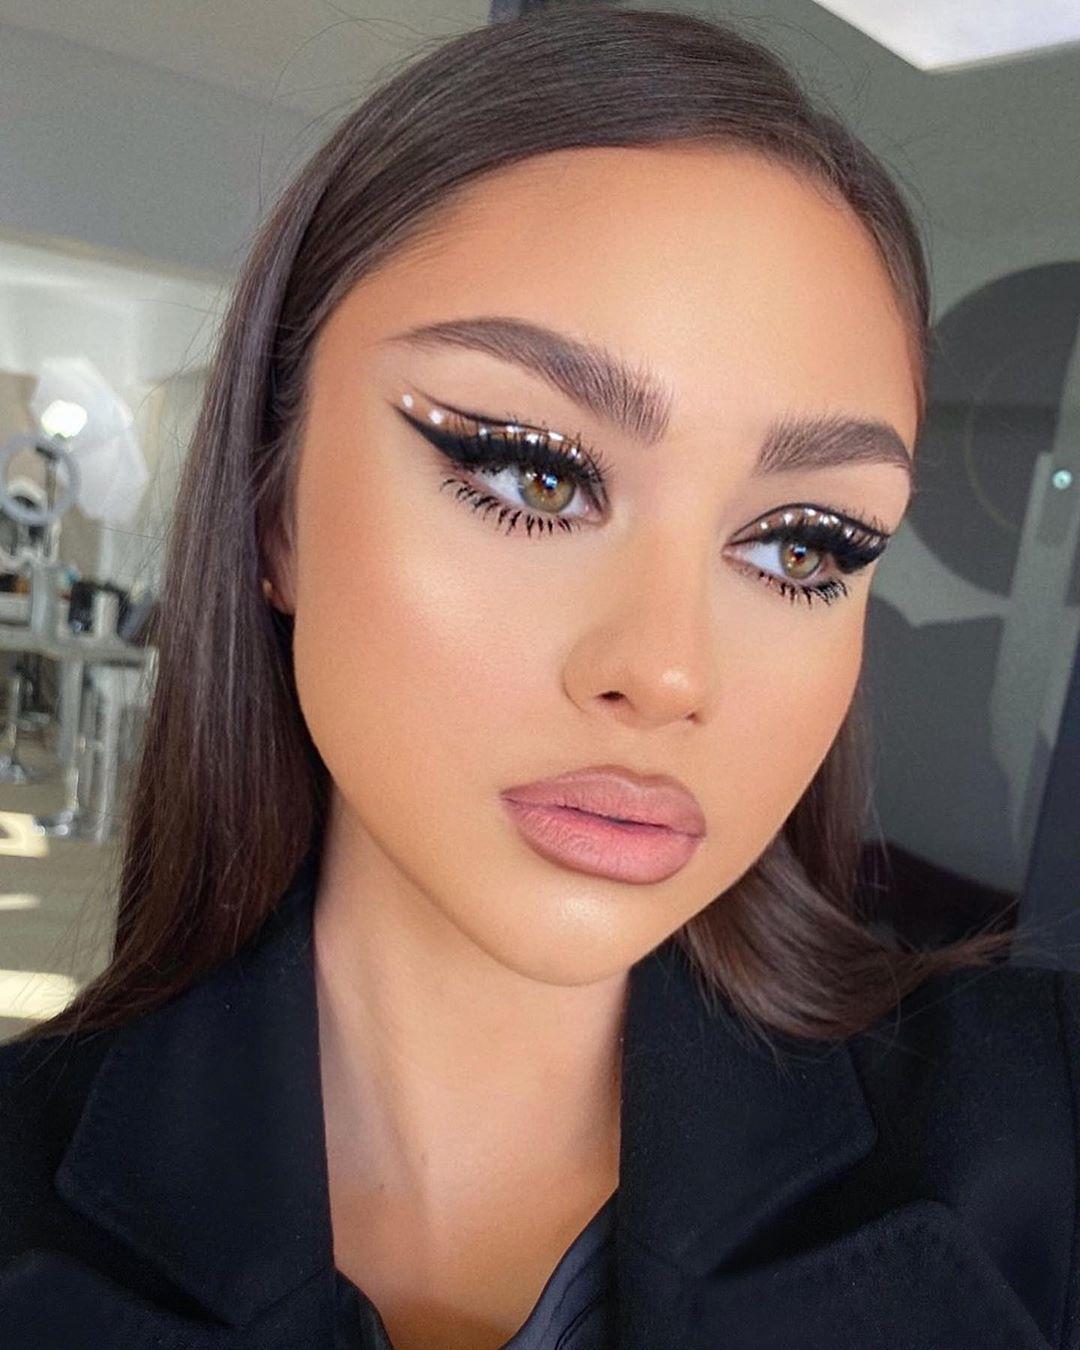 "𝐋𝐨𝐫𝐫𝐚𝐢𝐧𝐞 on Instagram ""Eyeliner & dots ⚪️ on beauty"